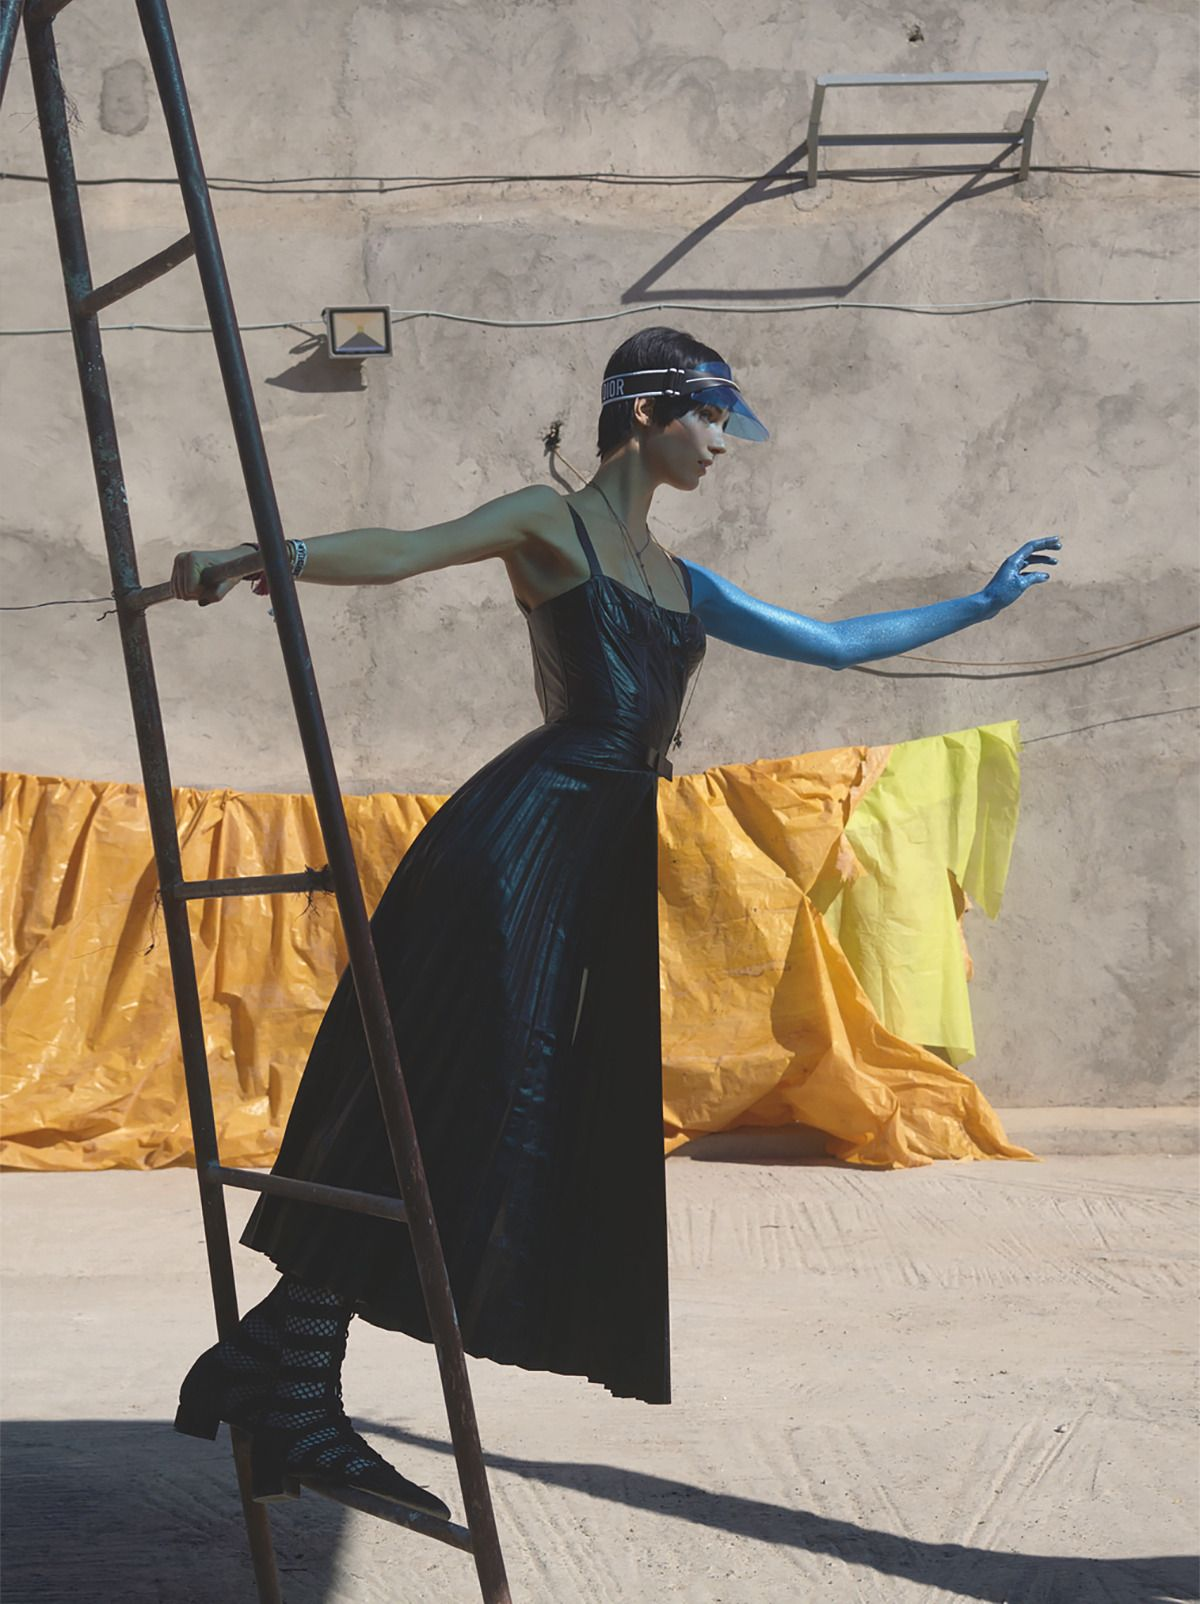 Overlay Intersection Publication: Vogue Italia February 2018 Model: Marte Mei, Sora Choi Photographer: Viviane Sassen Fashion Editor: Patti Wilson Hair: Irena Ruben Make Up: Irena Ruben